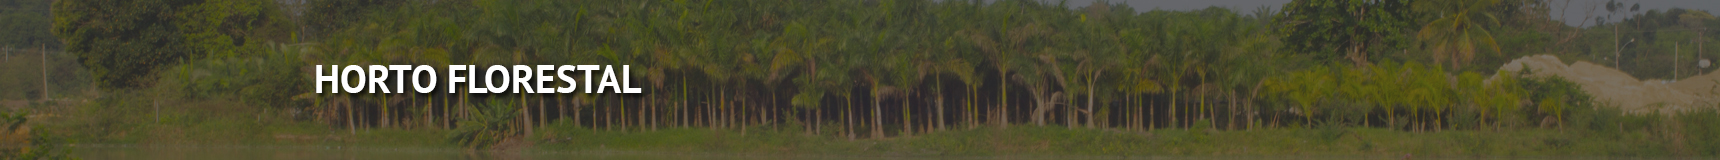 fundo_horto-florestal